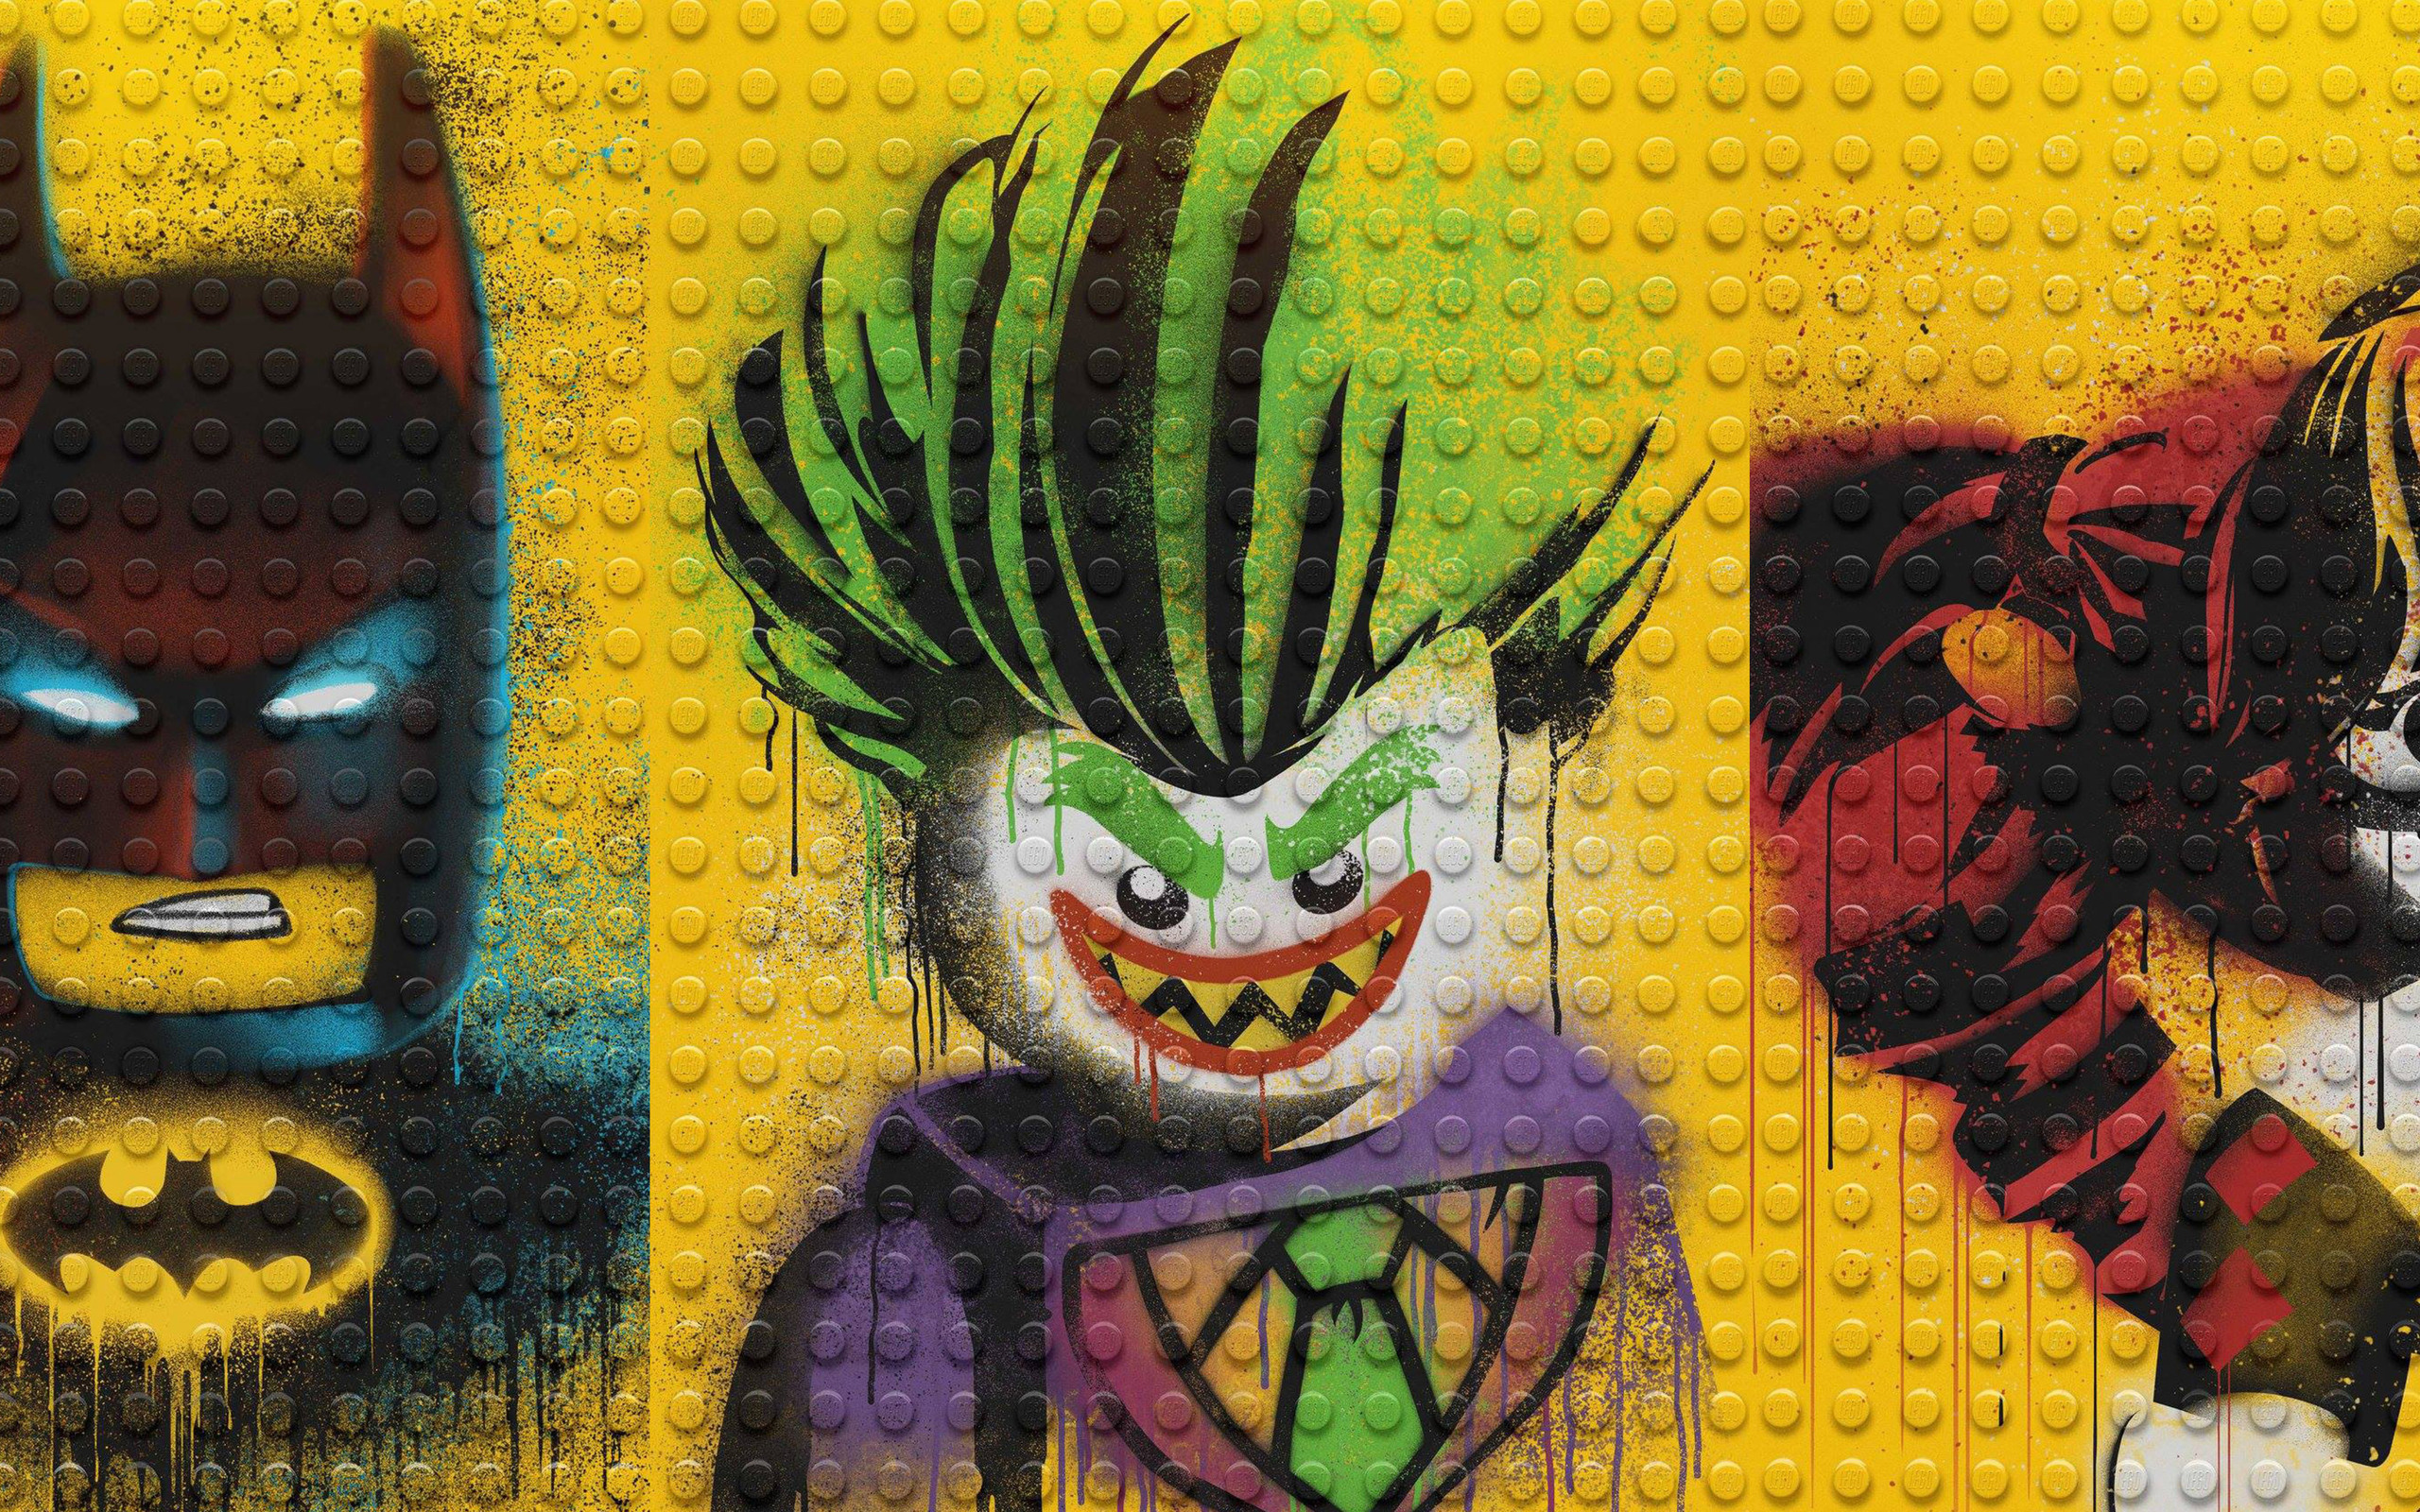 the-lego-batman-harley-quinn-and-joker-hd.jpg